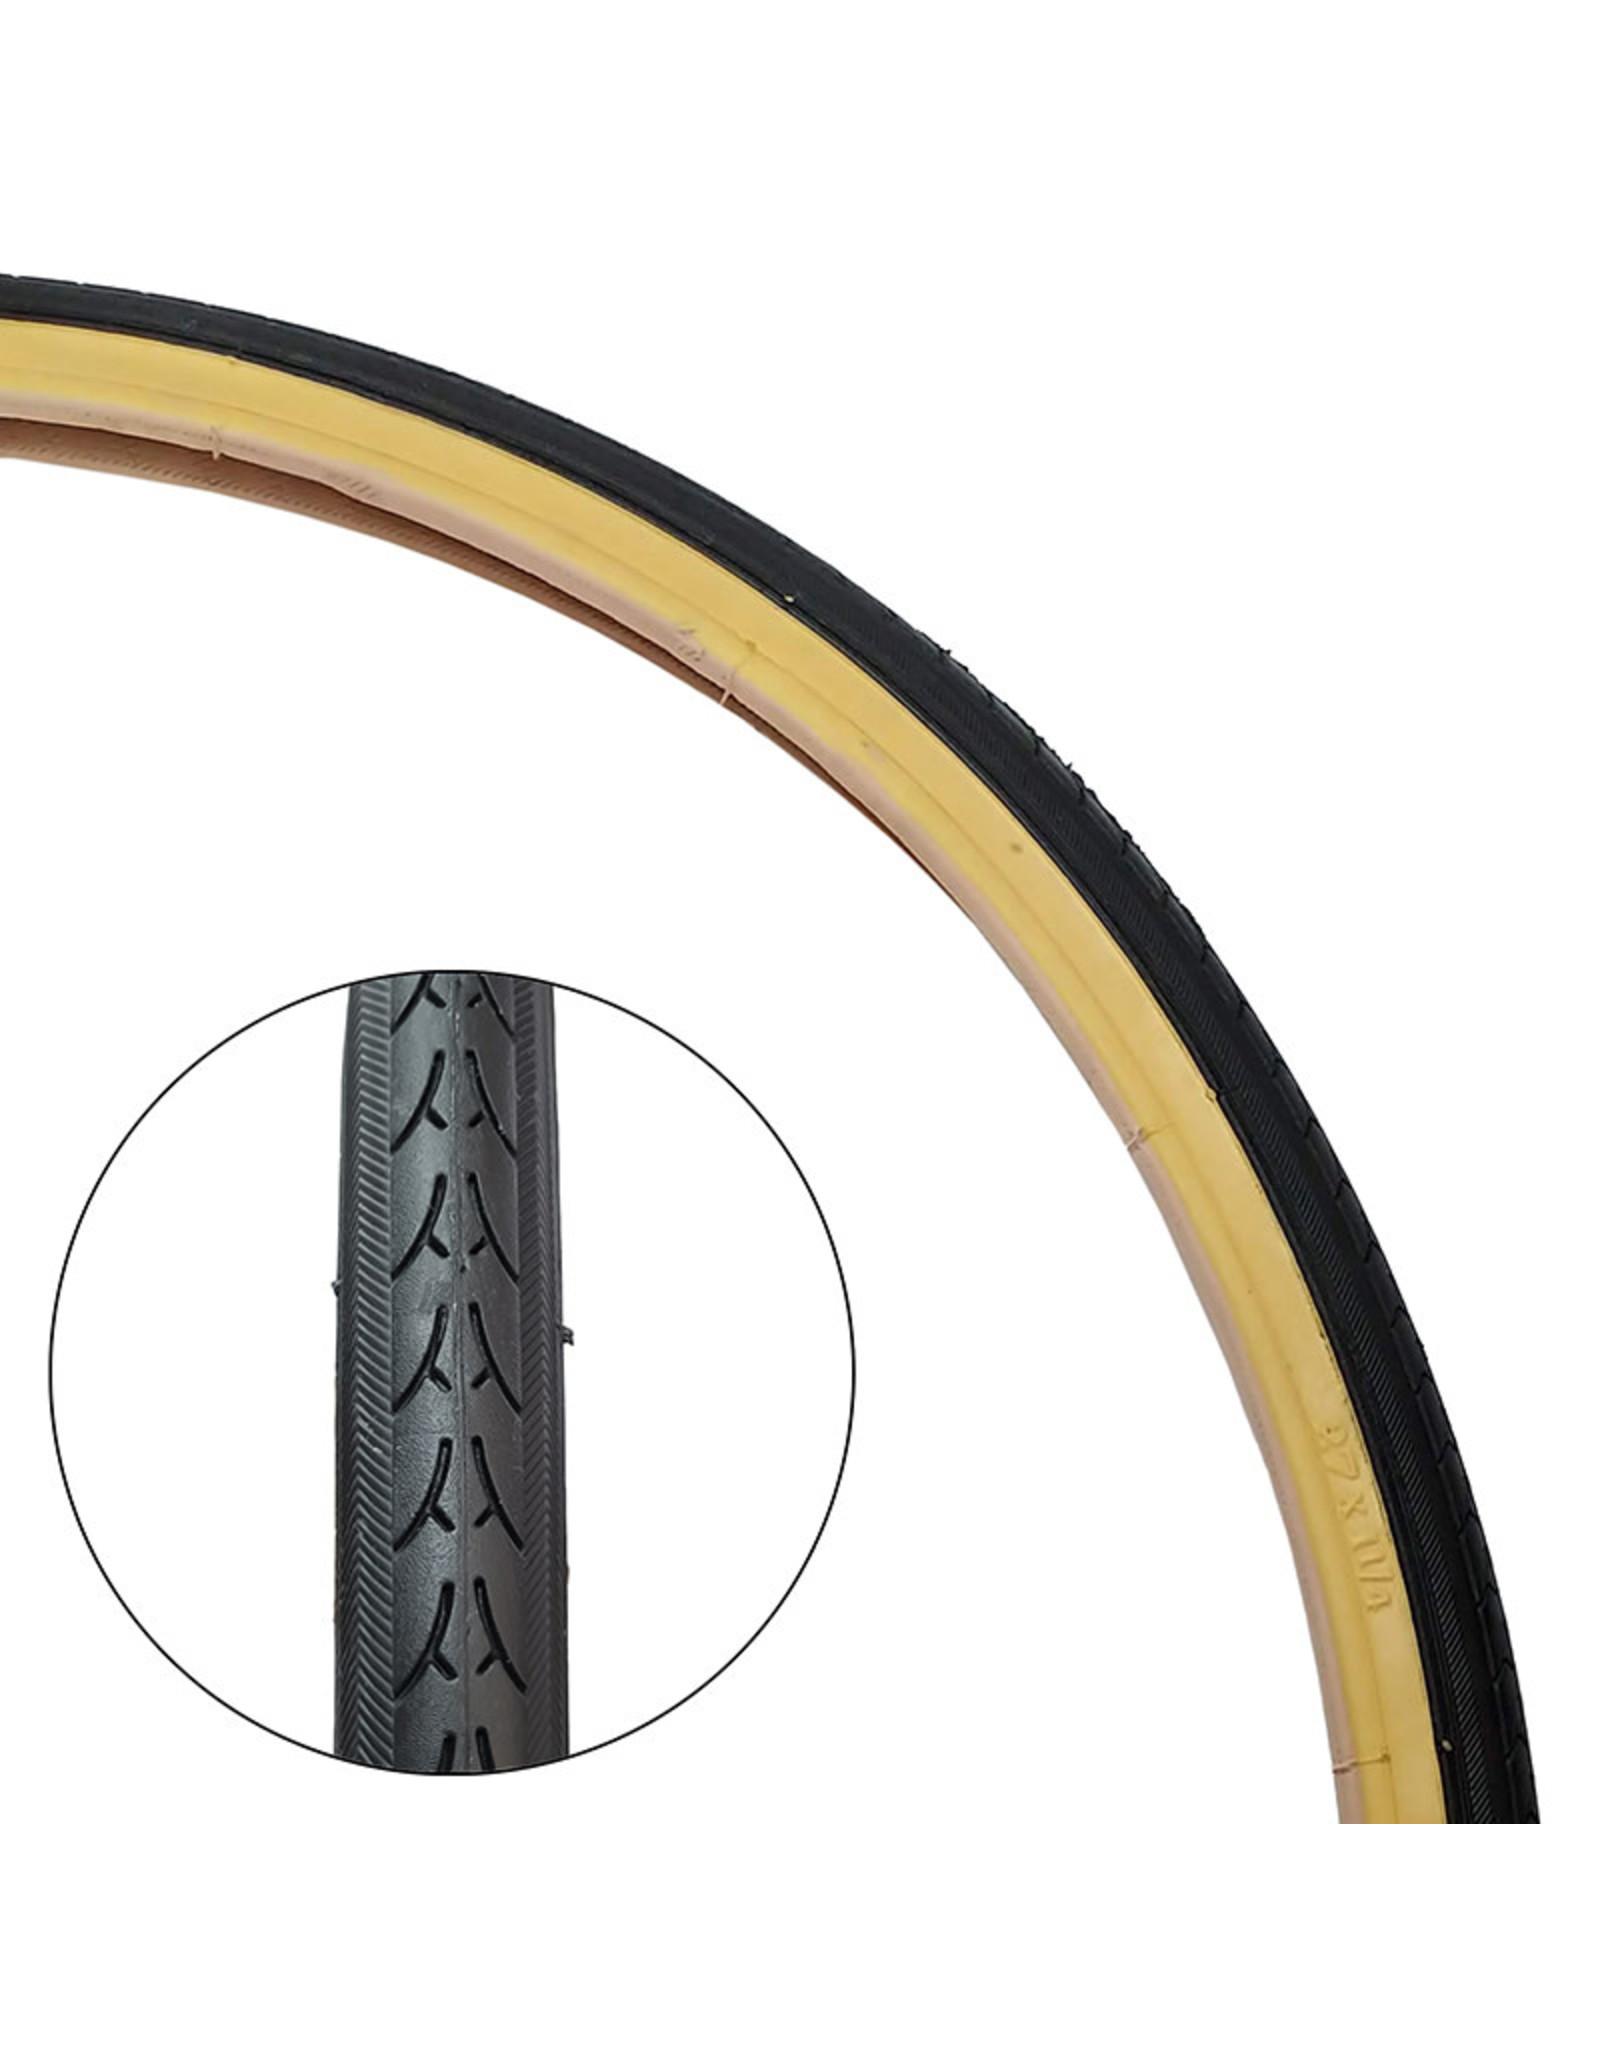 VEE Tire Co 27X1-1 / 4 tire